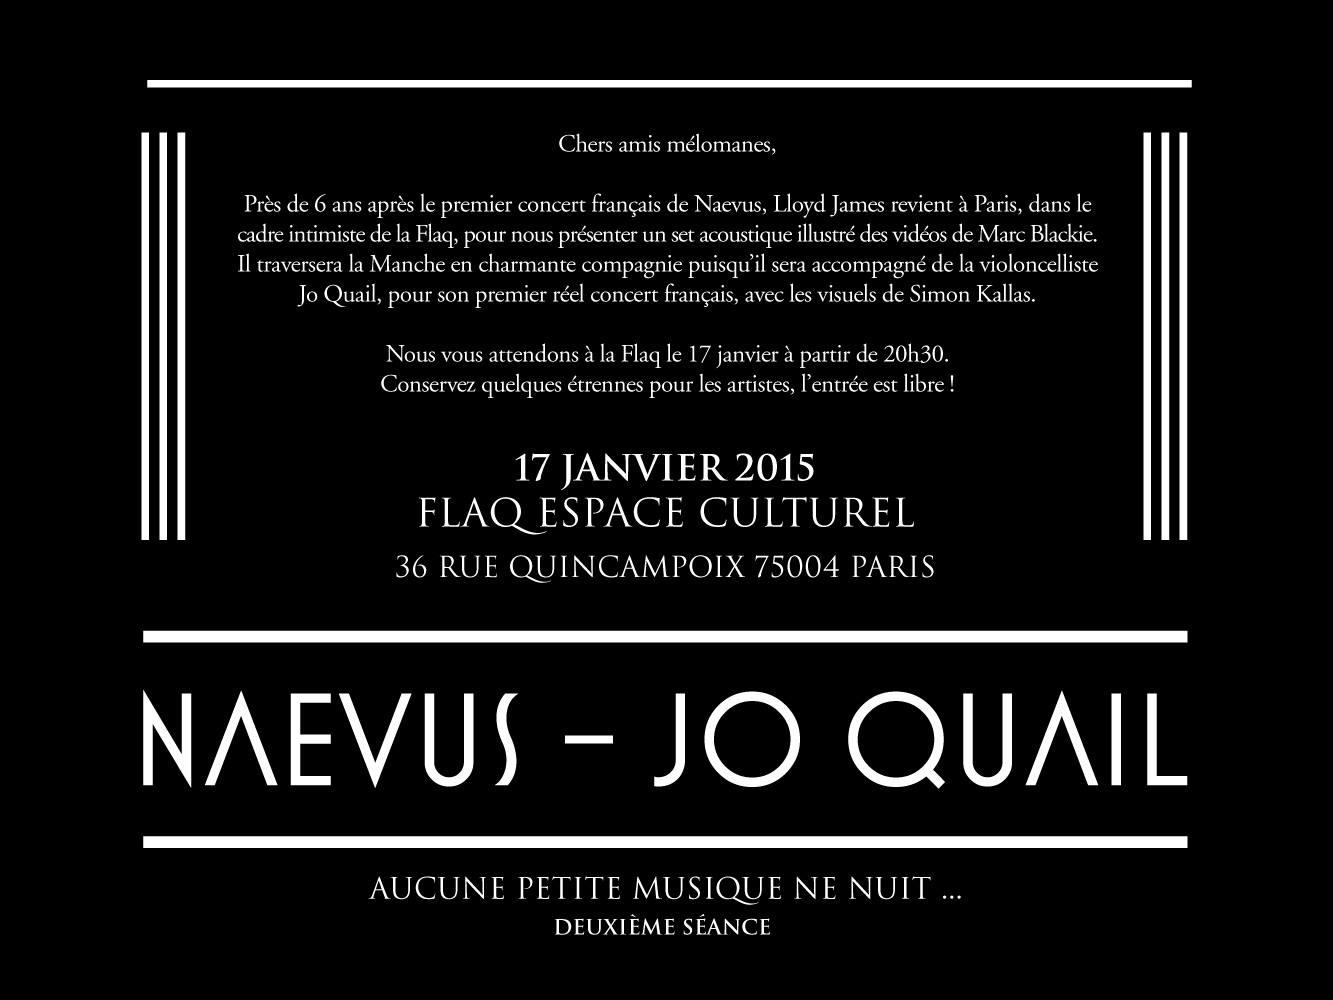 Paris Concert 17th January 2015